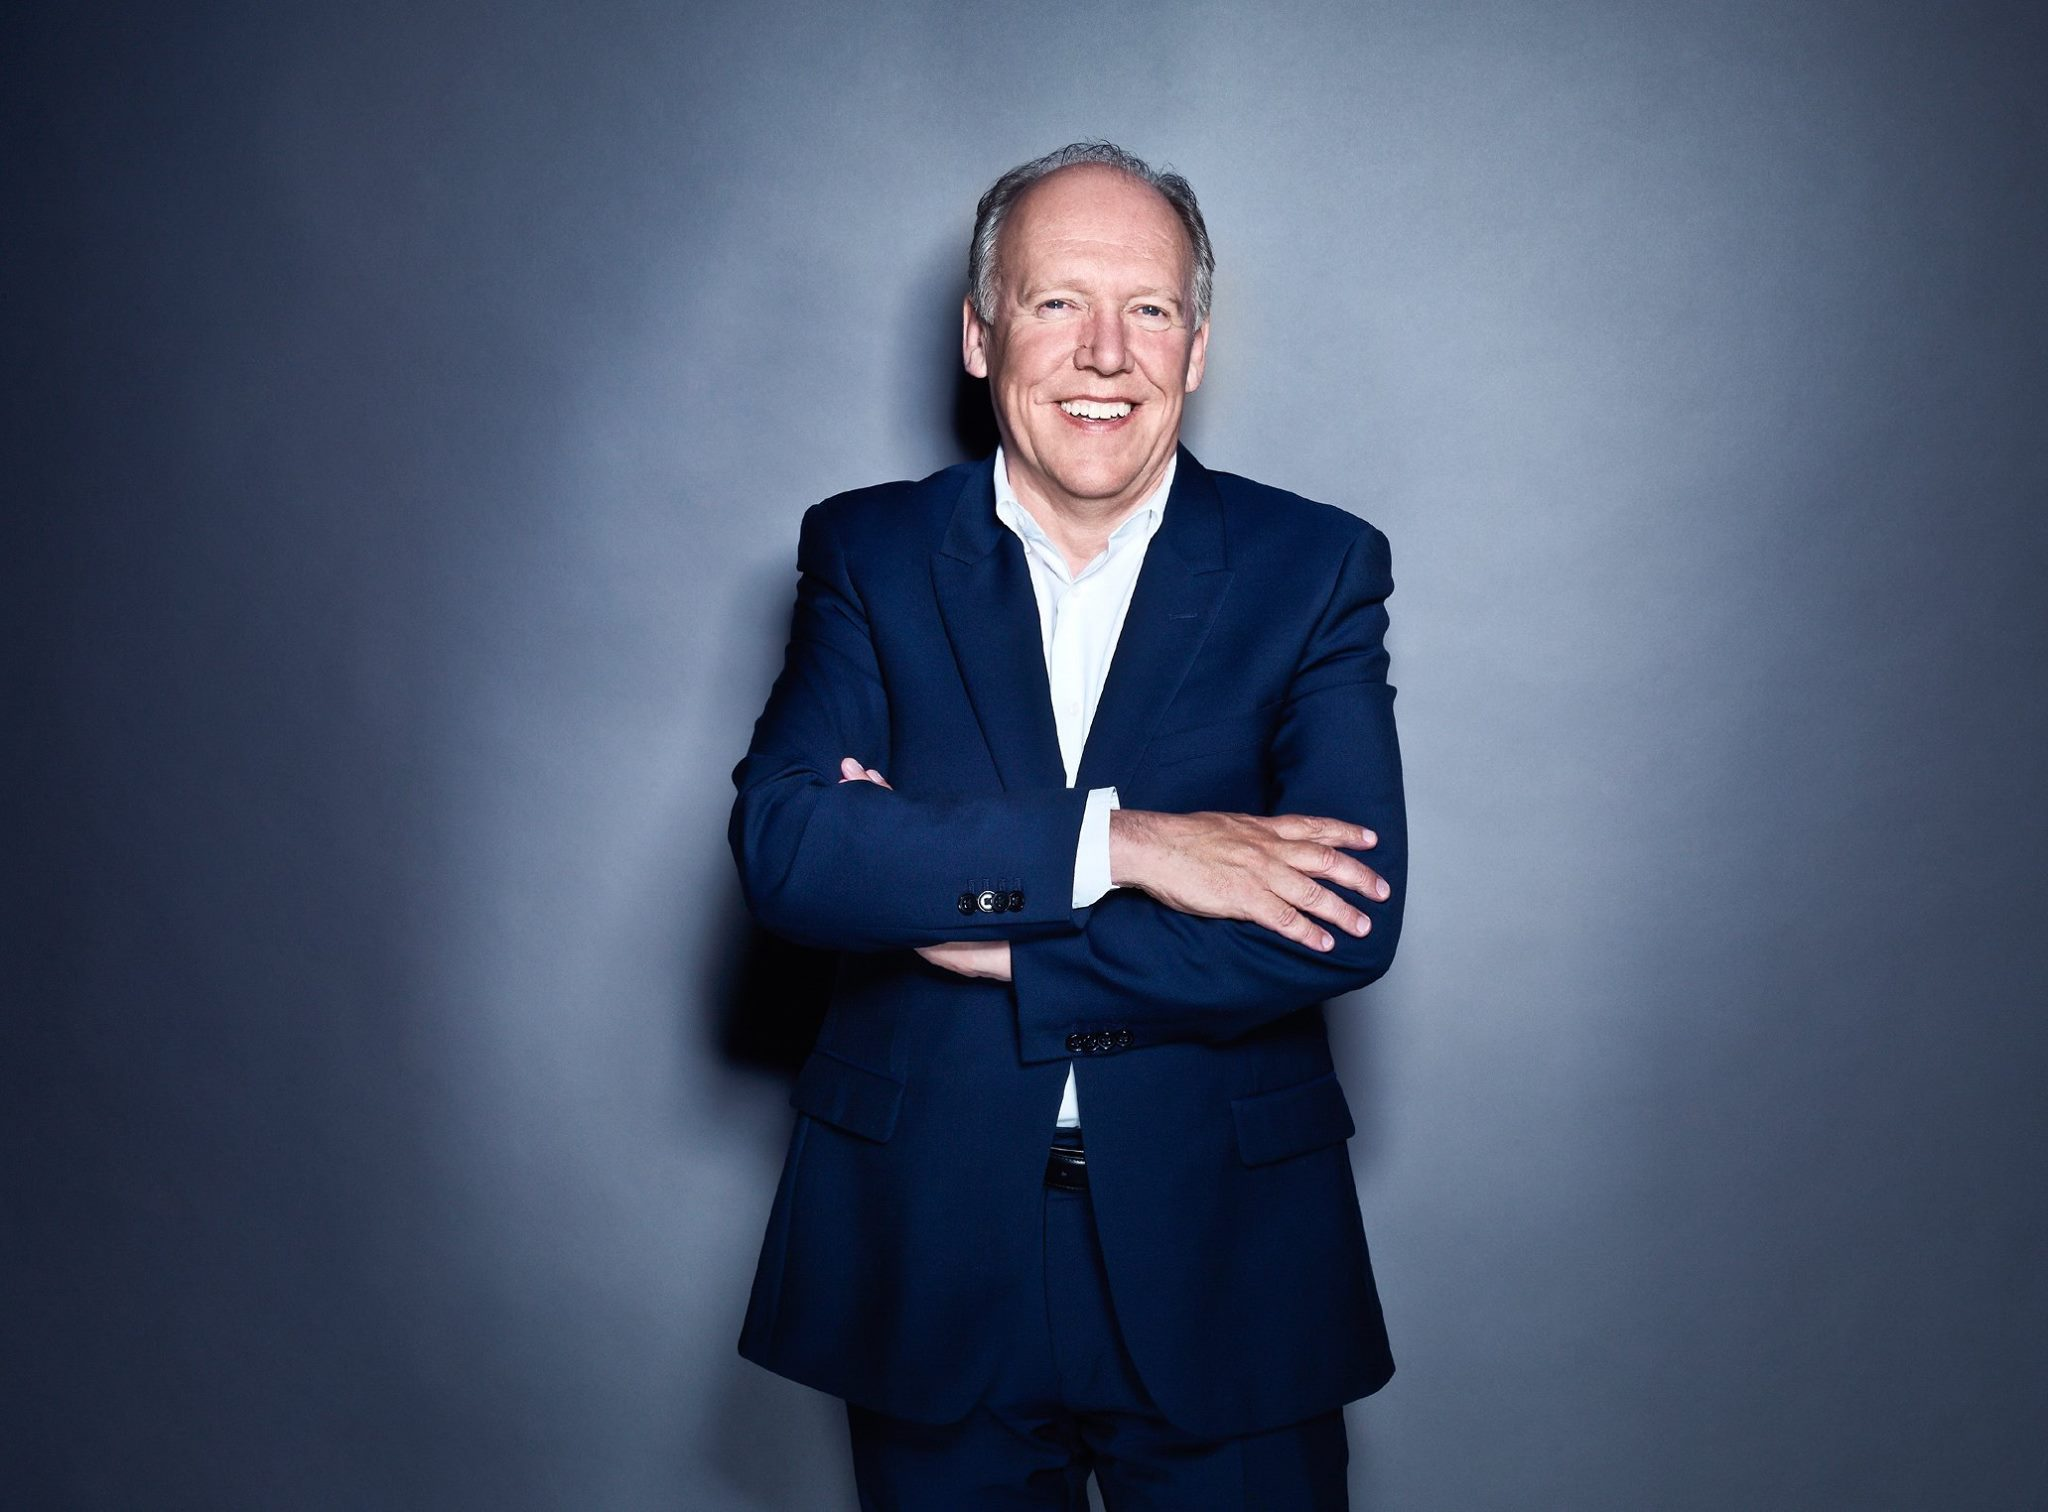 Celebrated car designer (Aston Martin, Jaguar) Ian Callum CBE